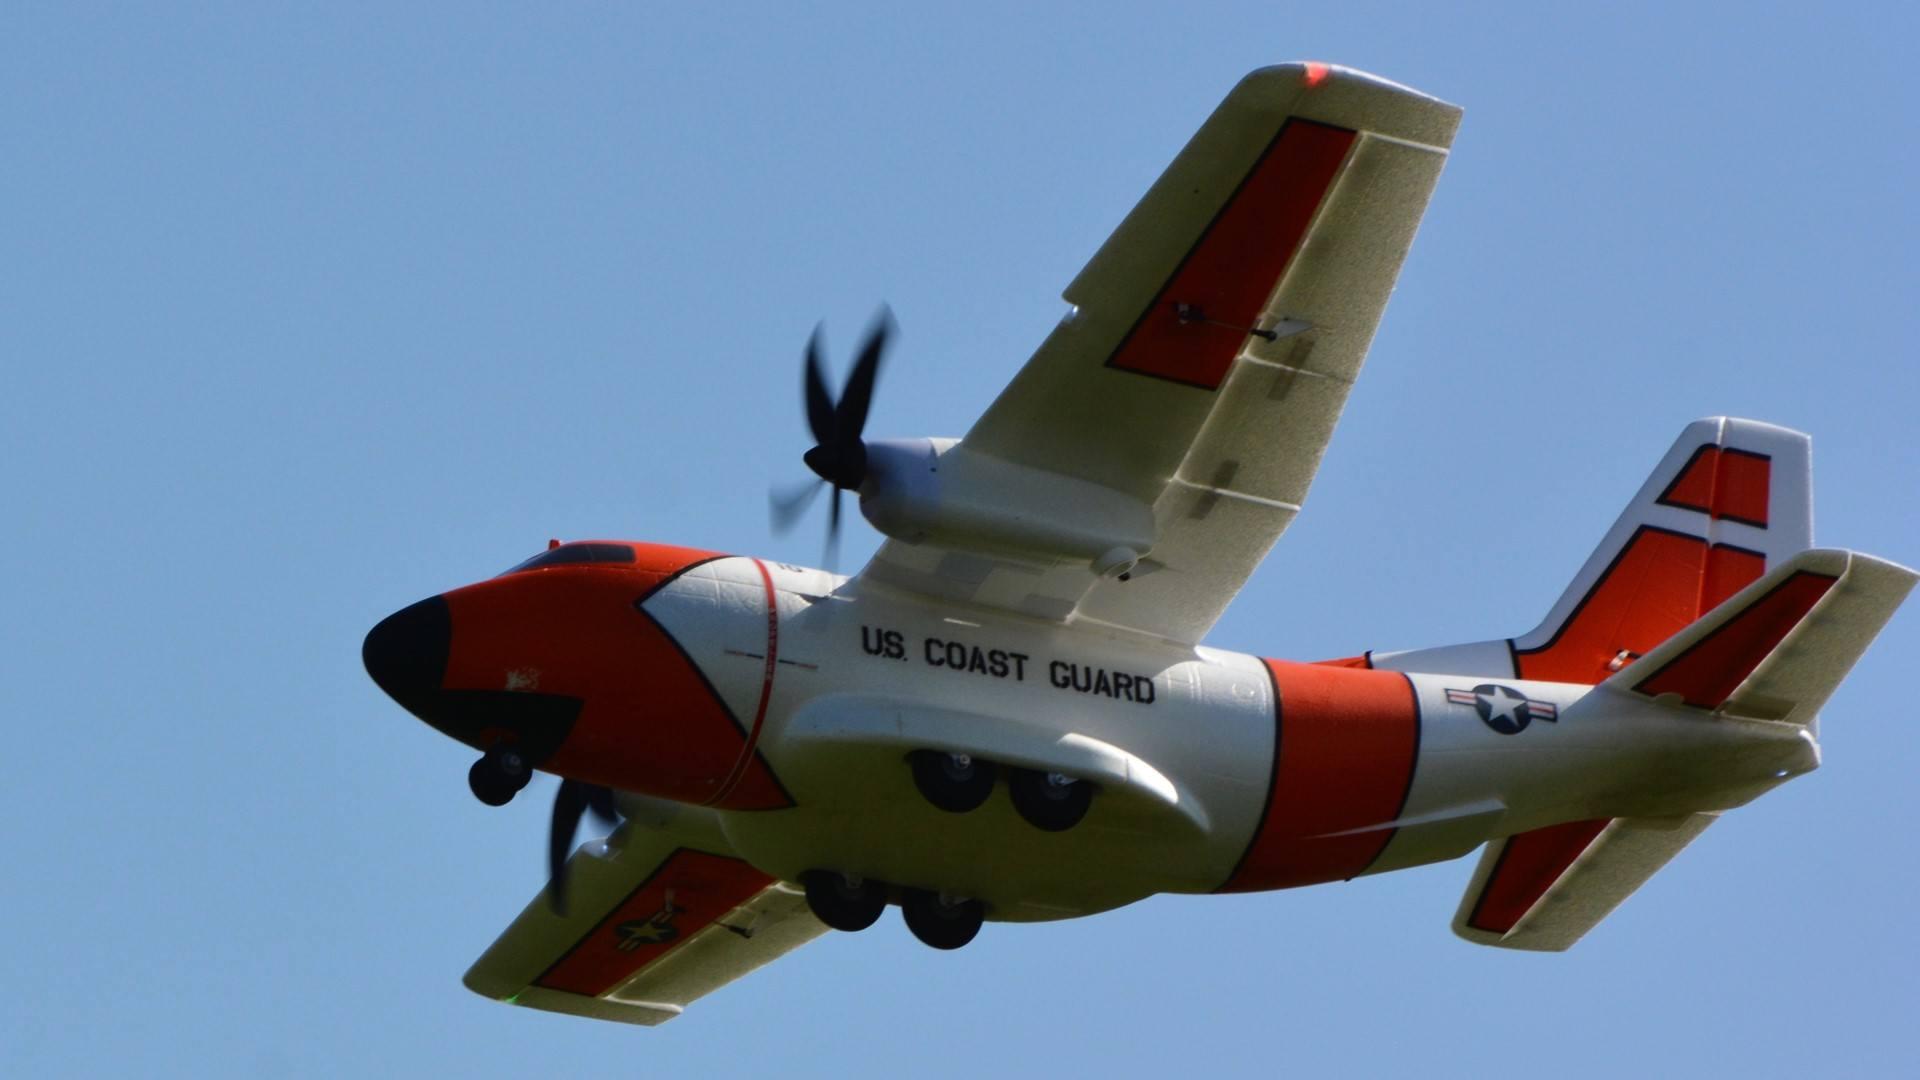 C-27J Spartan (E-Flite EC 1500 Twin)